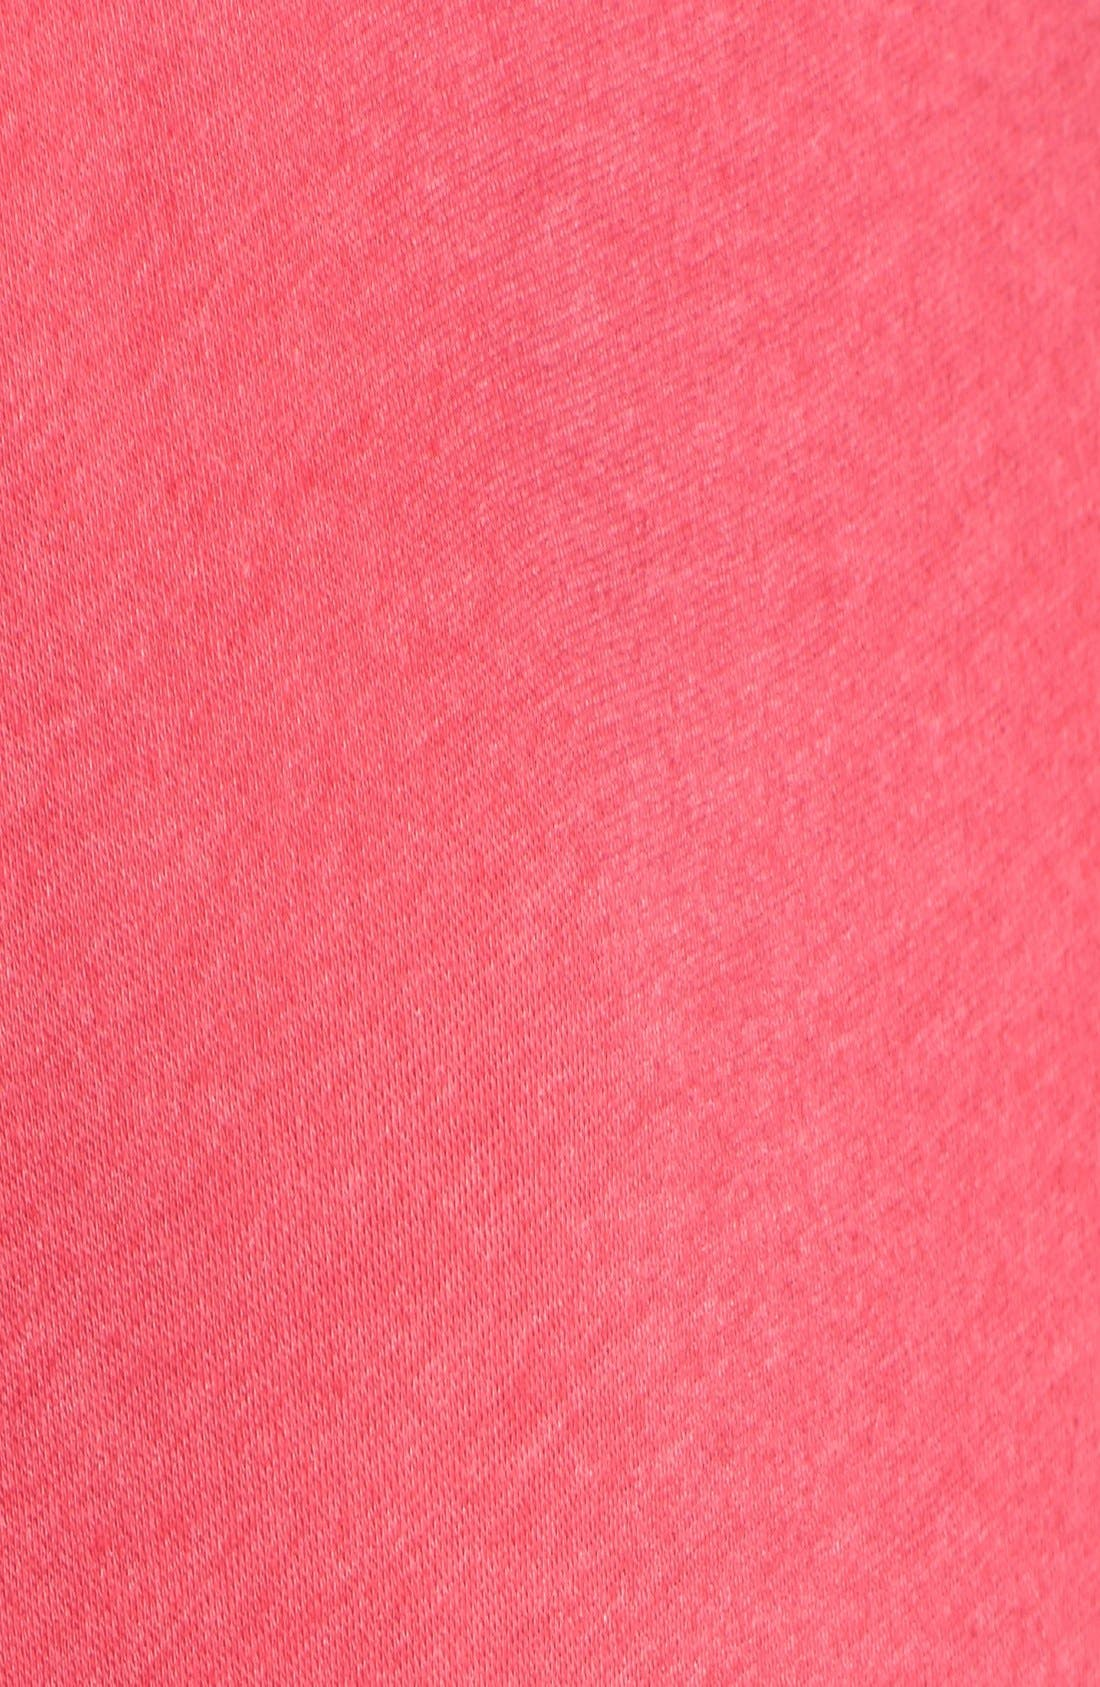 ,                             Scoop Neck Long Sleeve Tee,                             Alternate thumbnail 63, color,                             630